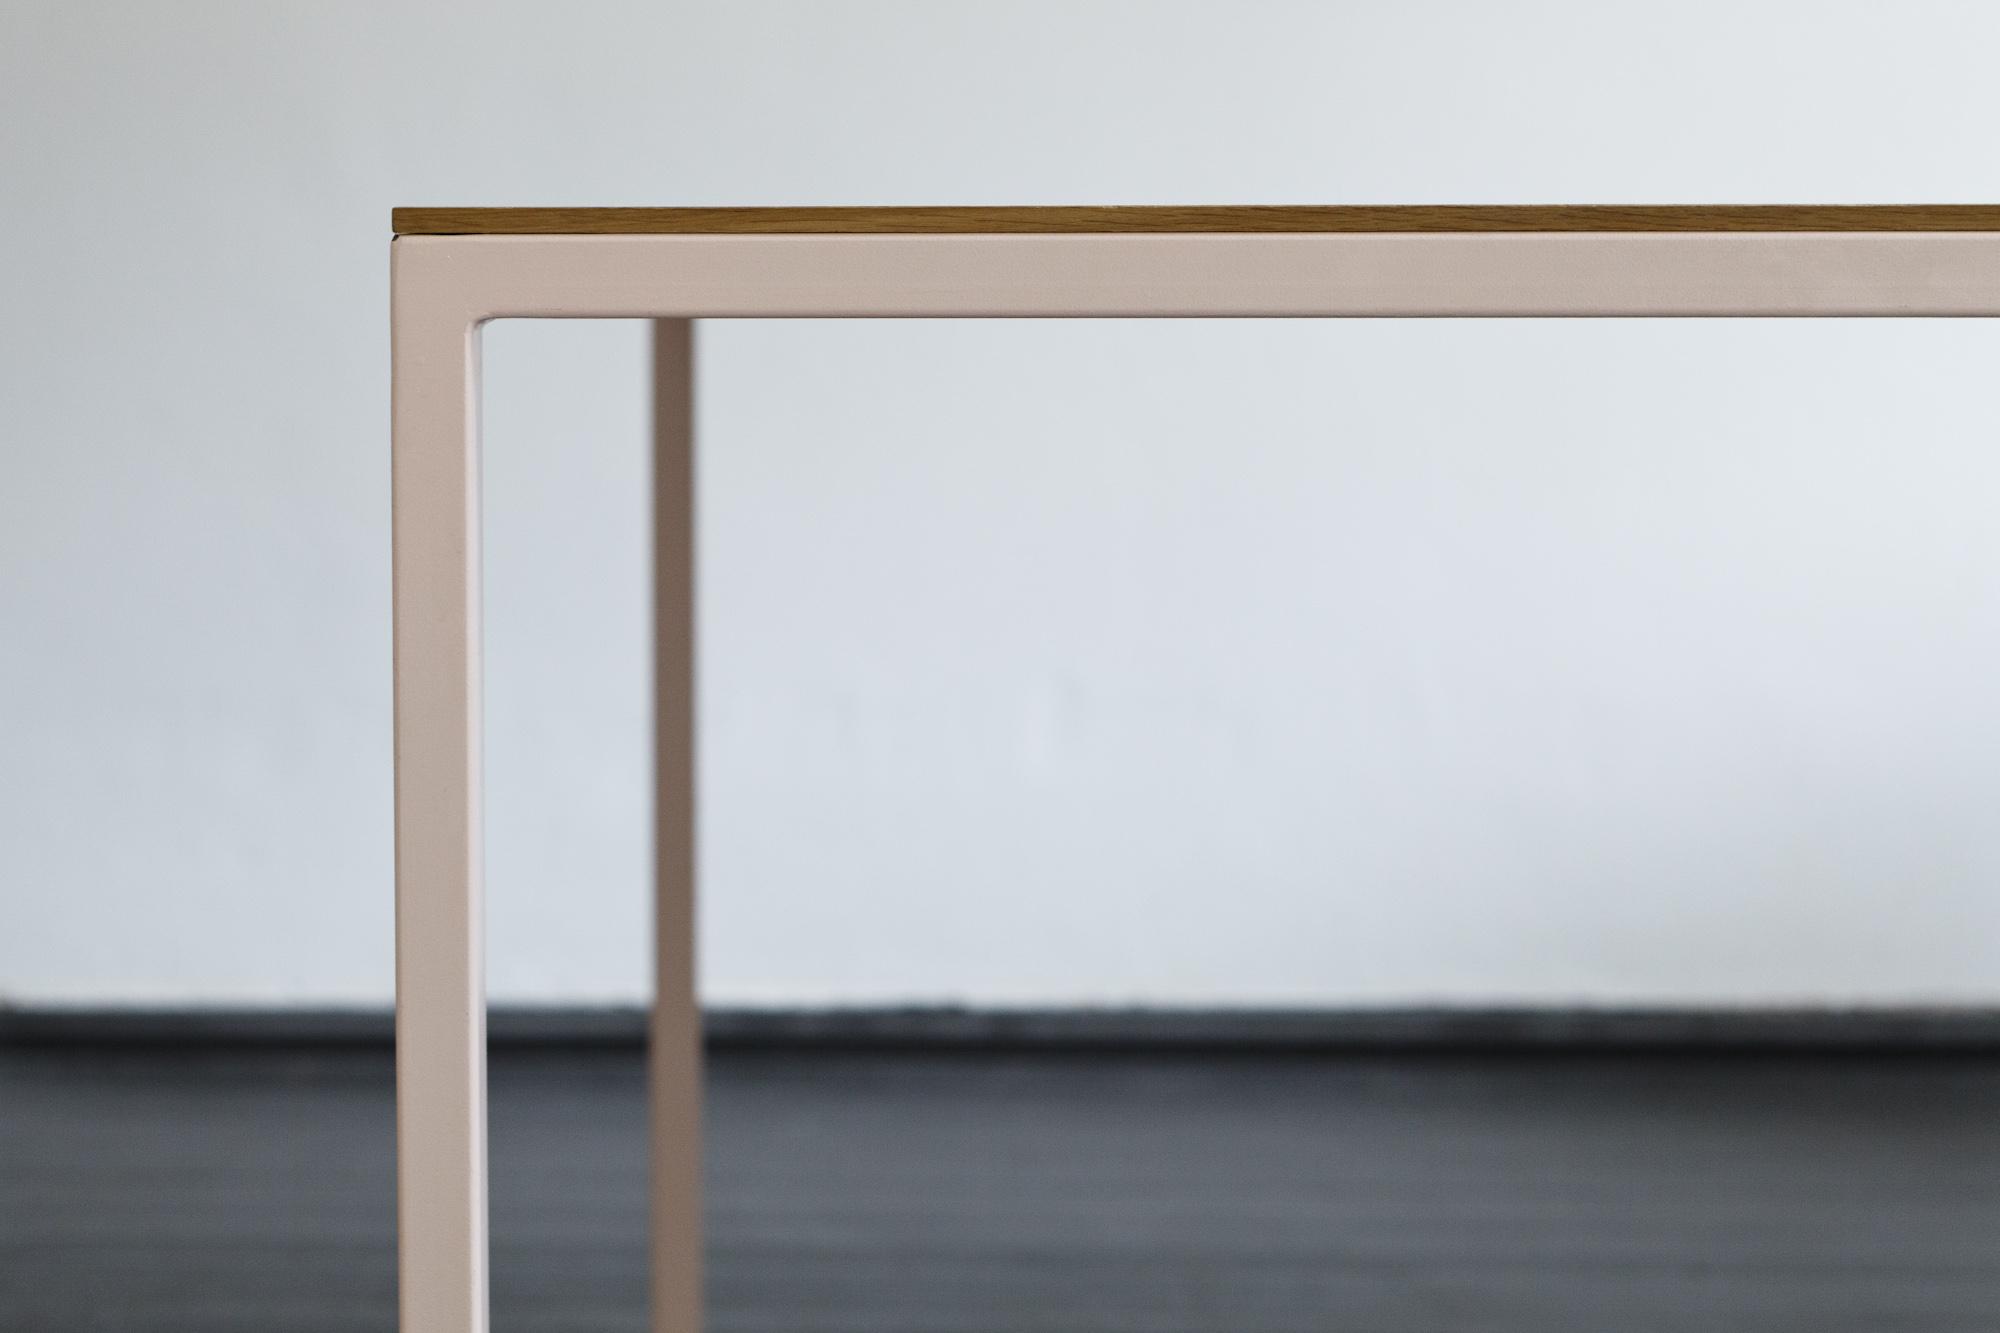 table-tib-so-hme-6231.jpg